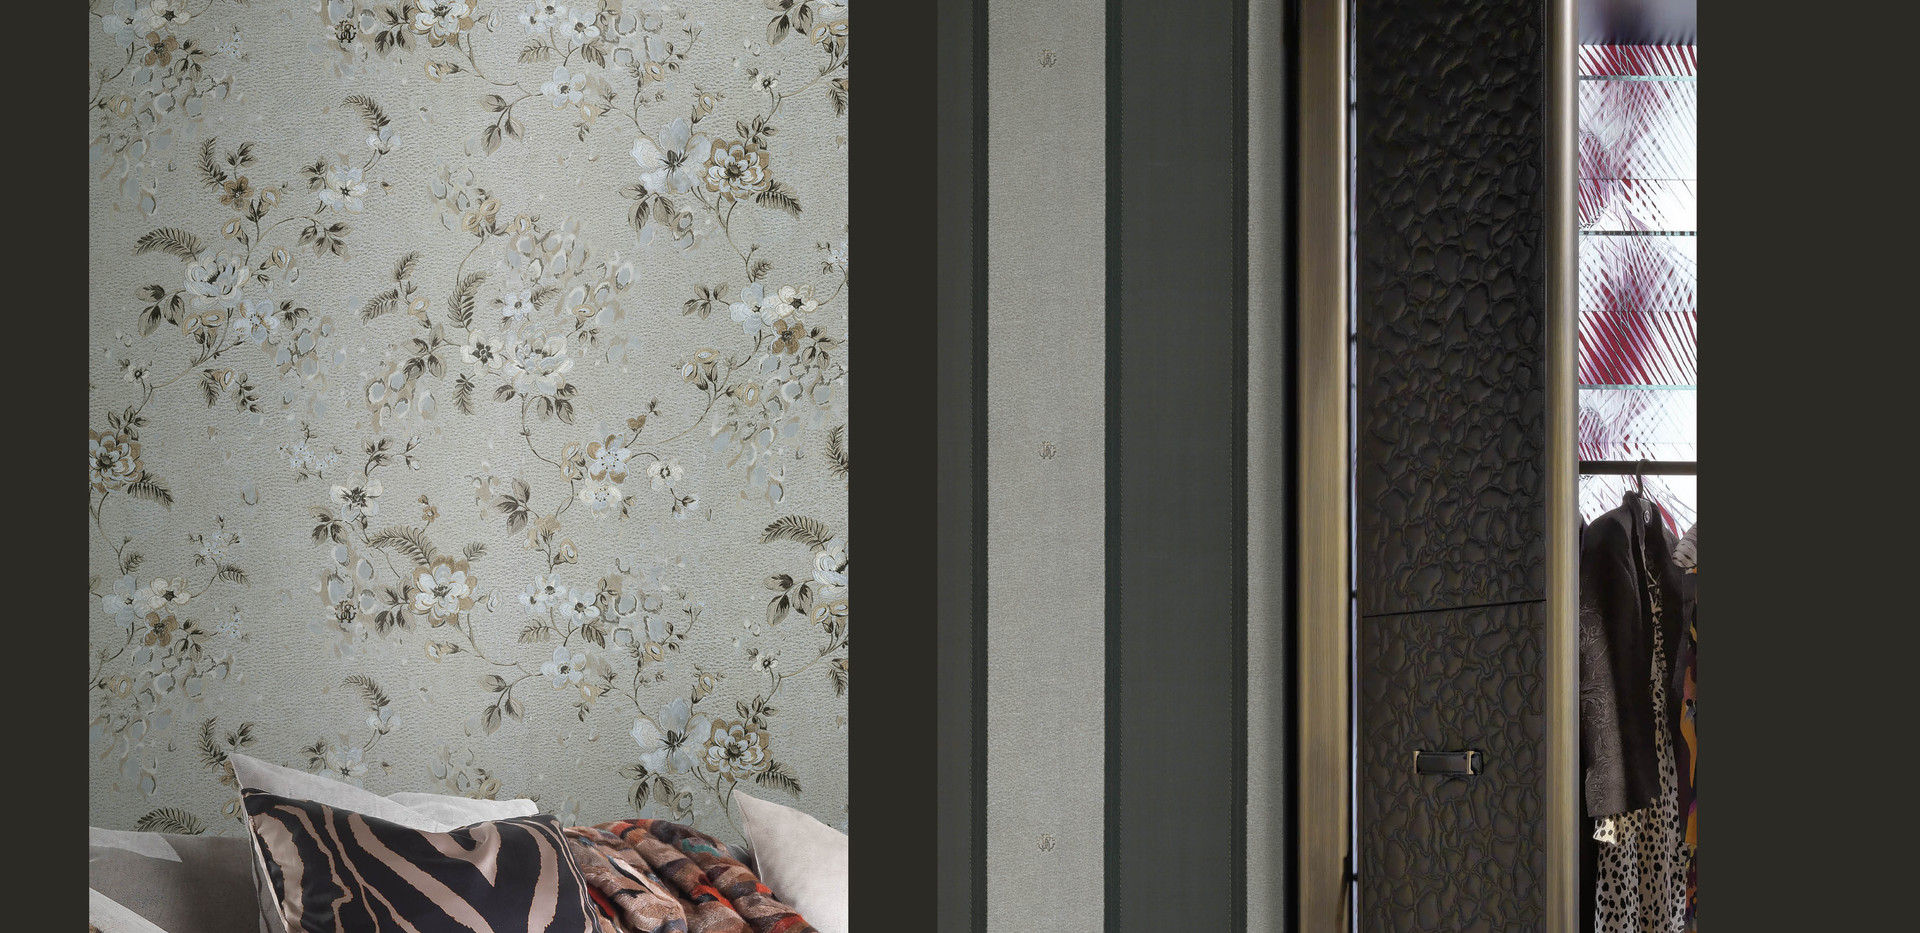 LifeNcolors-best-wallpaper-branded-luxury-pattern-floral-grey-light